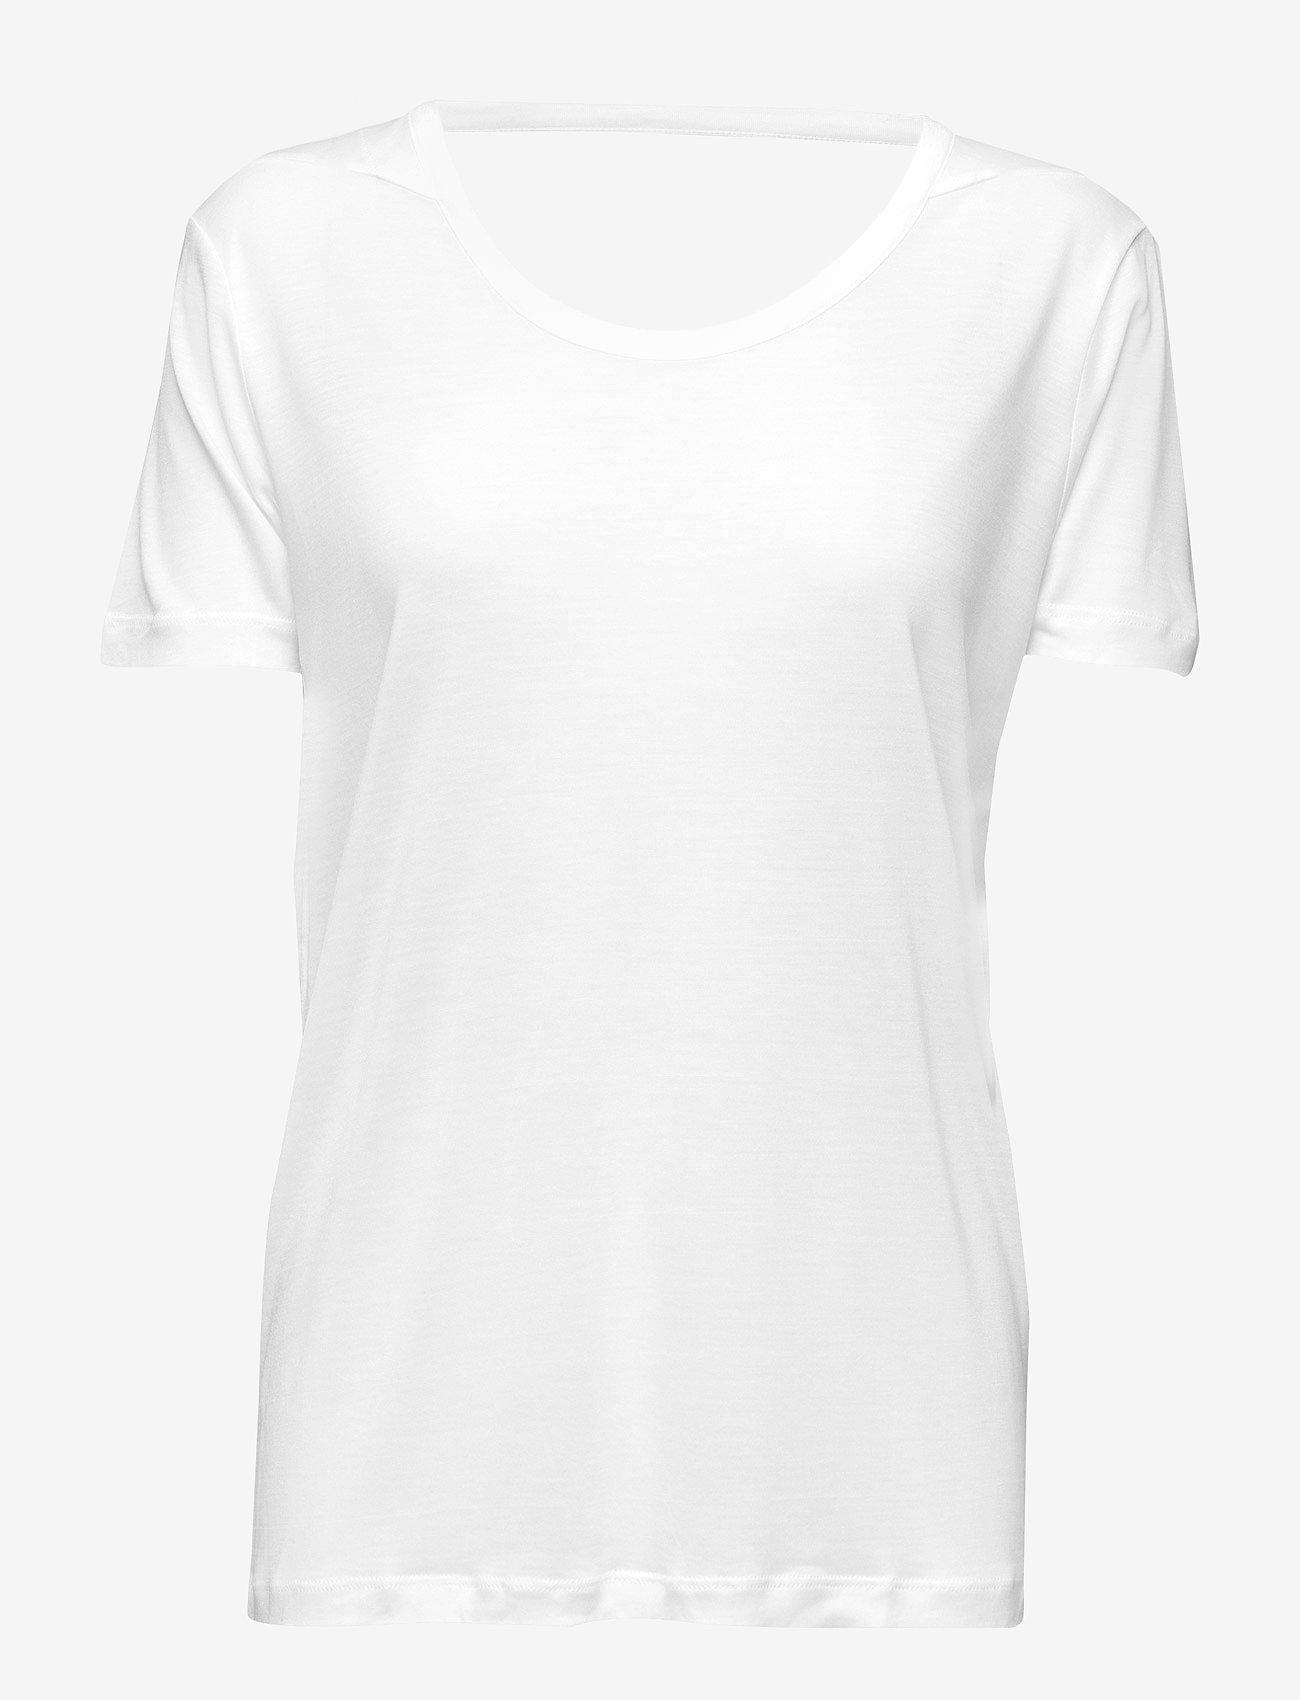 Whyred - FONDA - basic t-shirts - white - 0